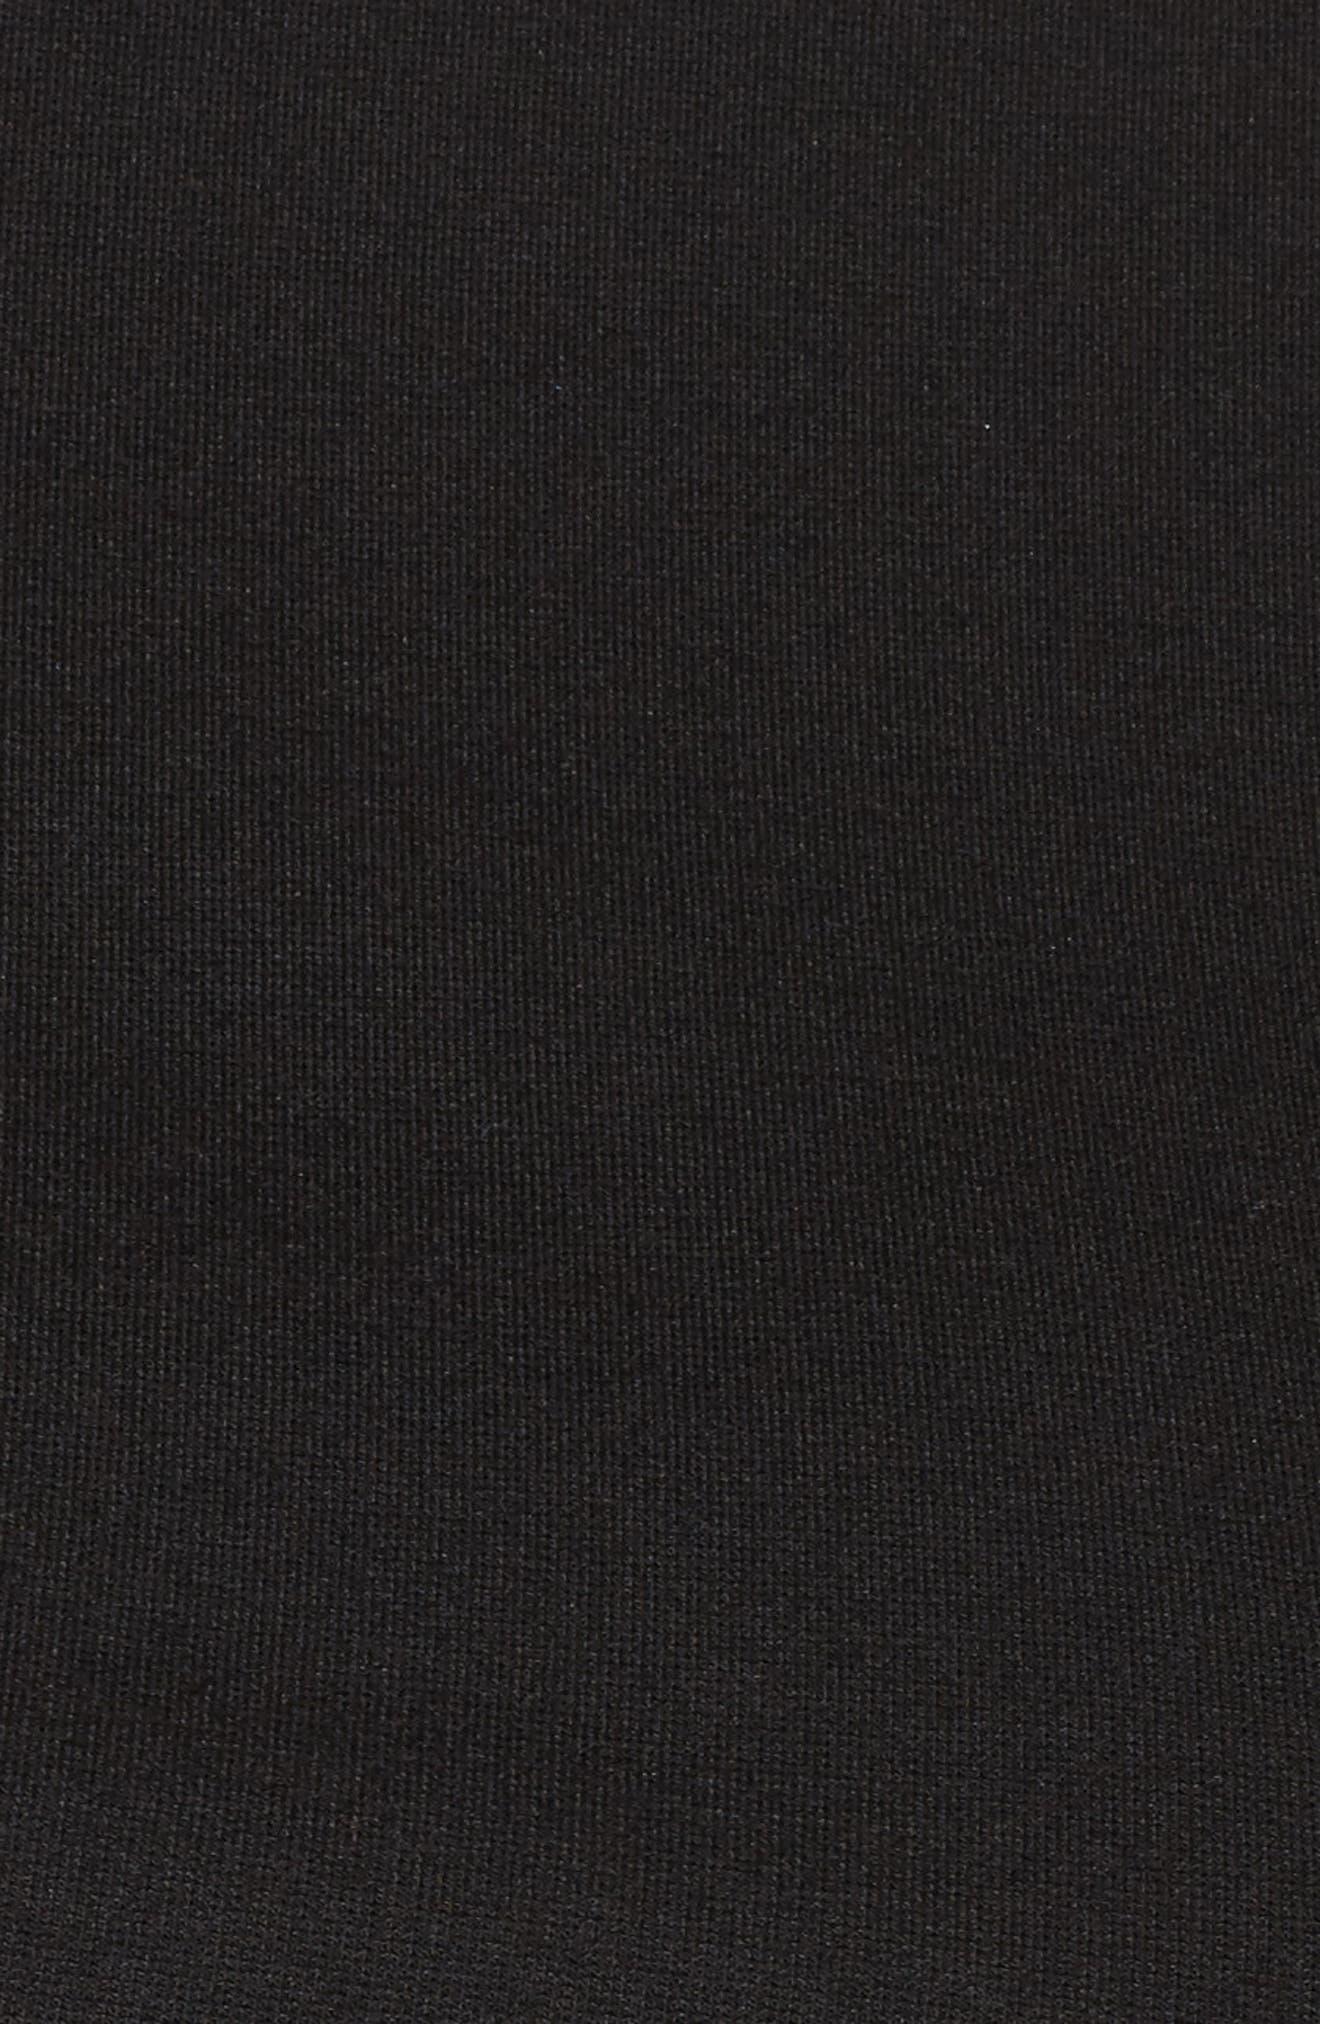 Alternate Image 5  - LOST INK Satin Frill Hem Top (Plus Size)